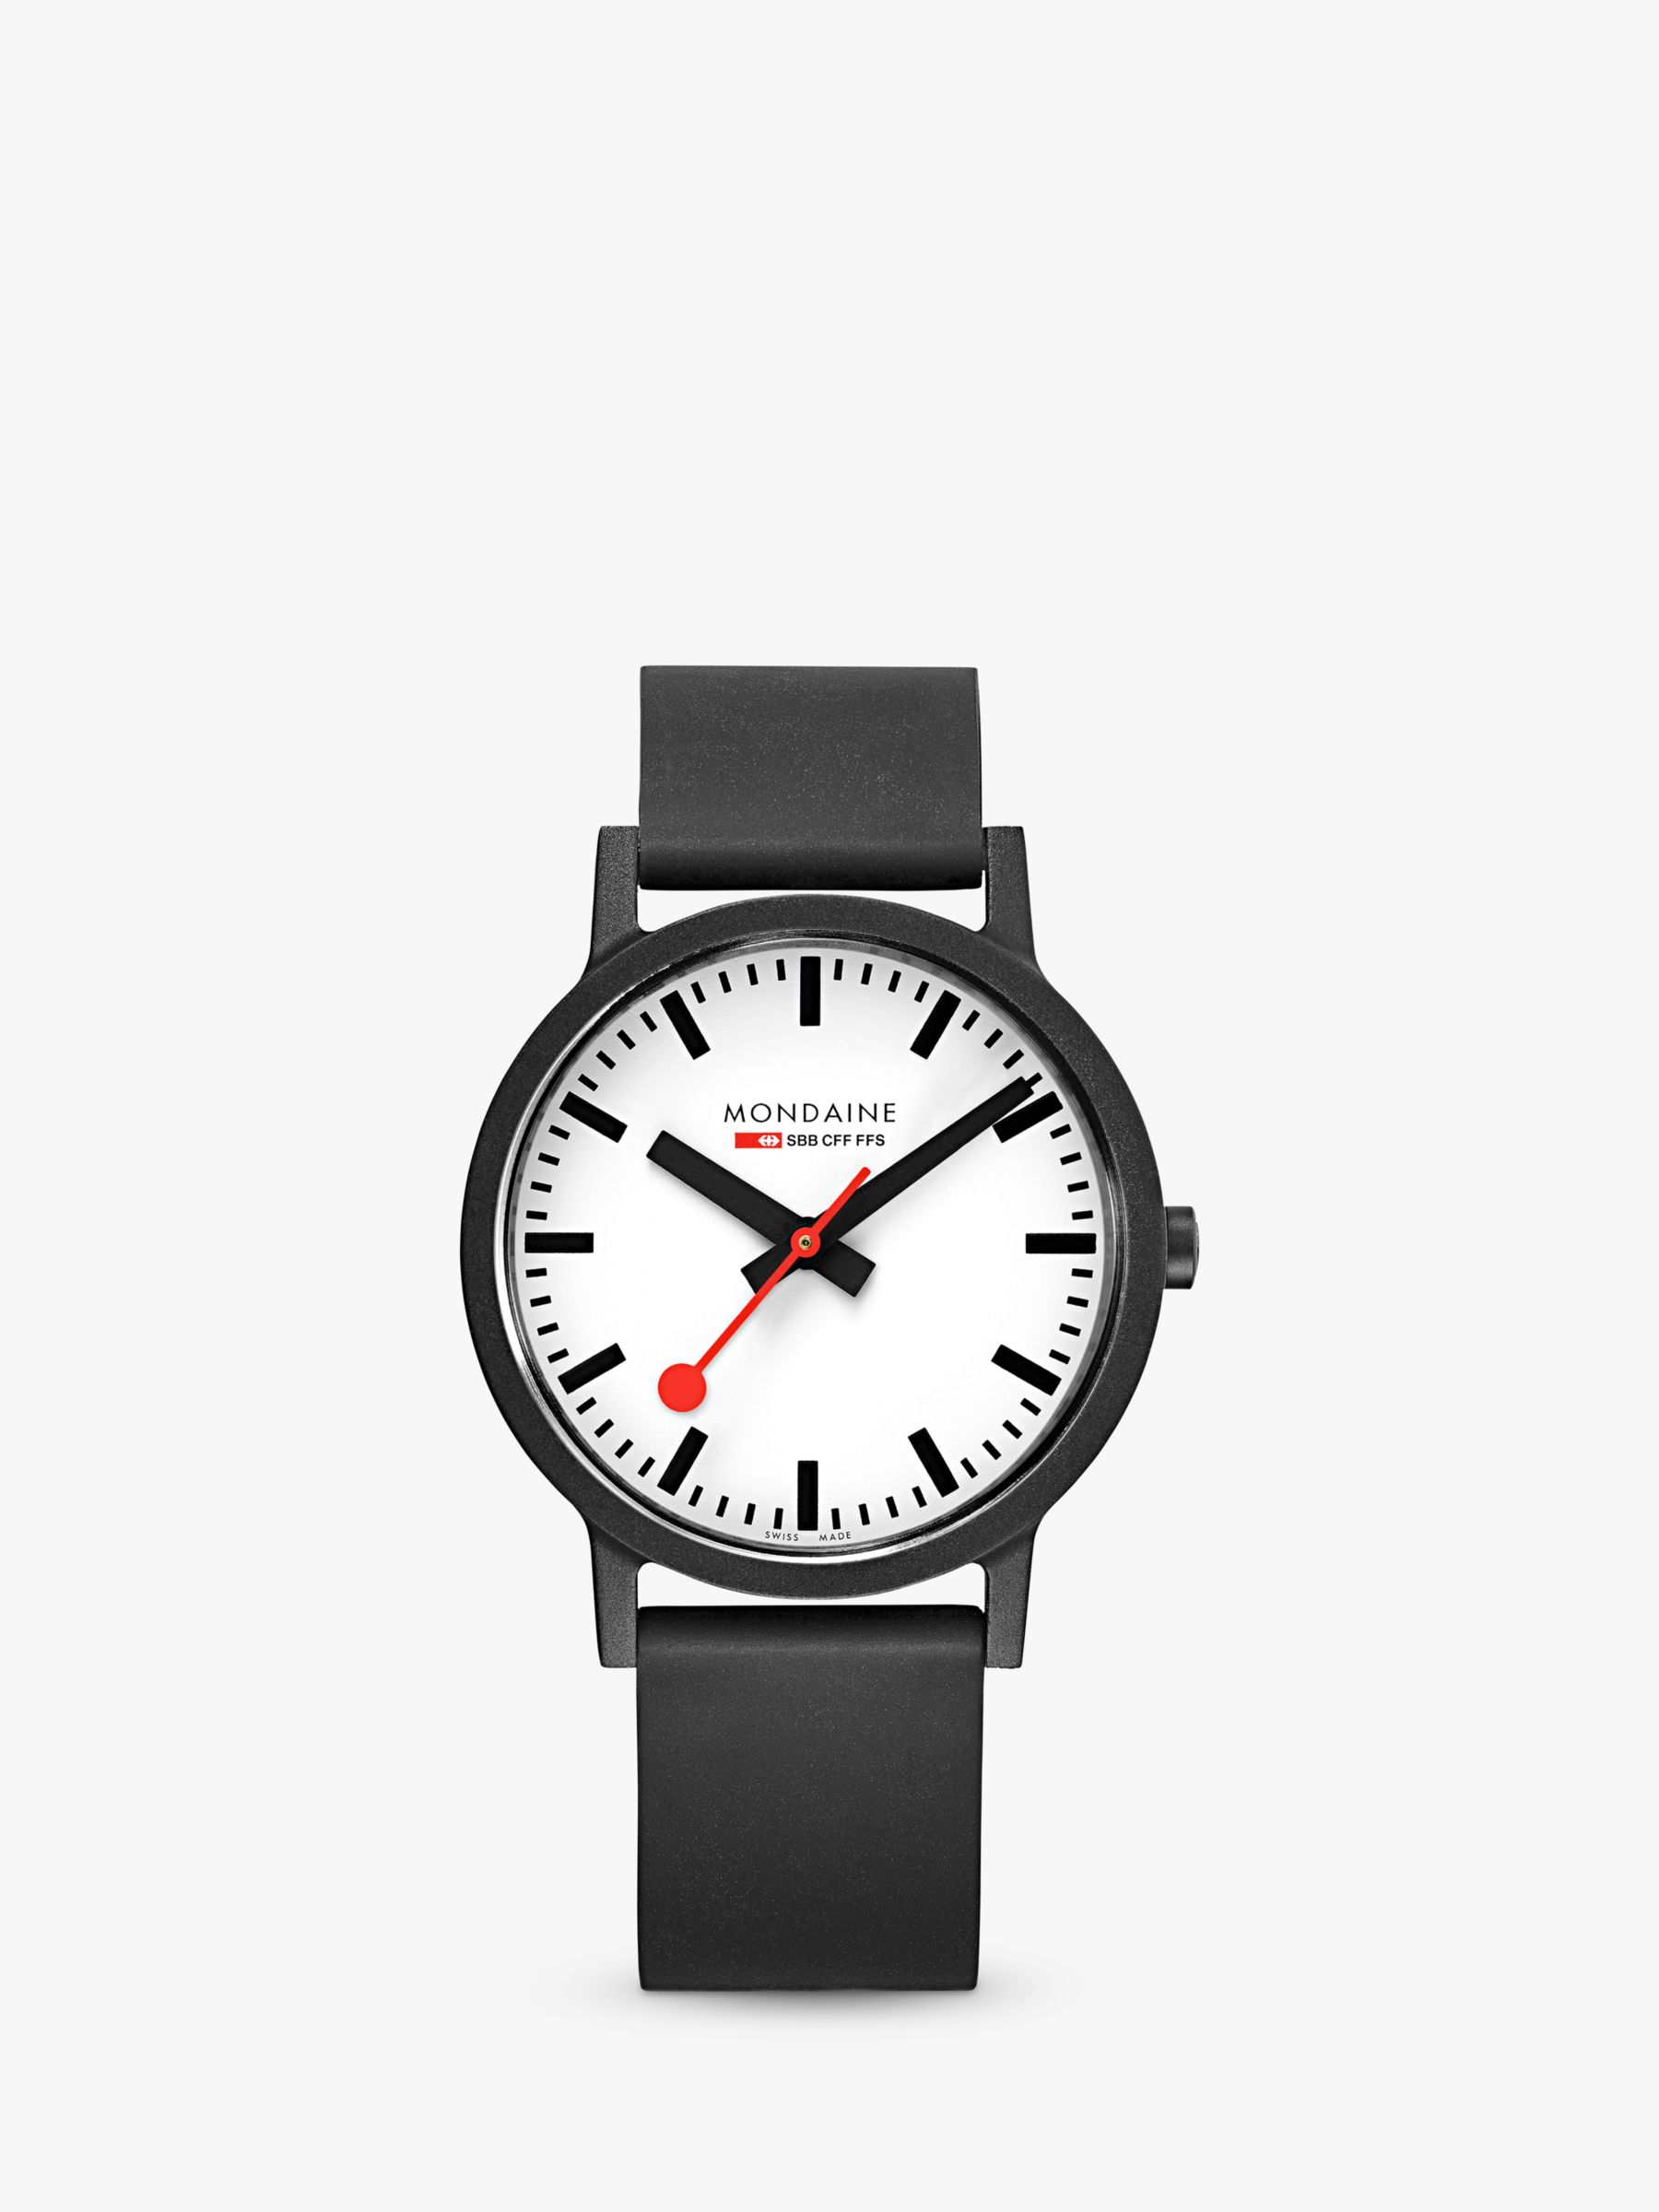 Mondaine Mondaine Unisex Essence Rubber Strap Watch